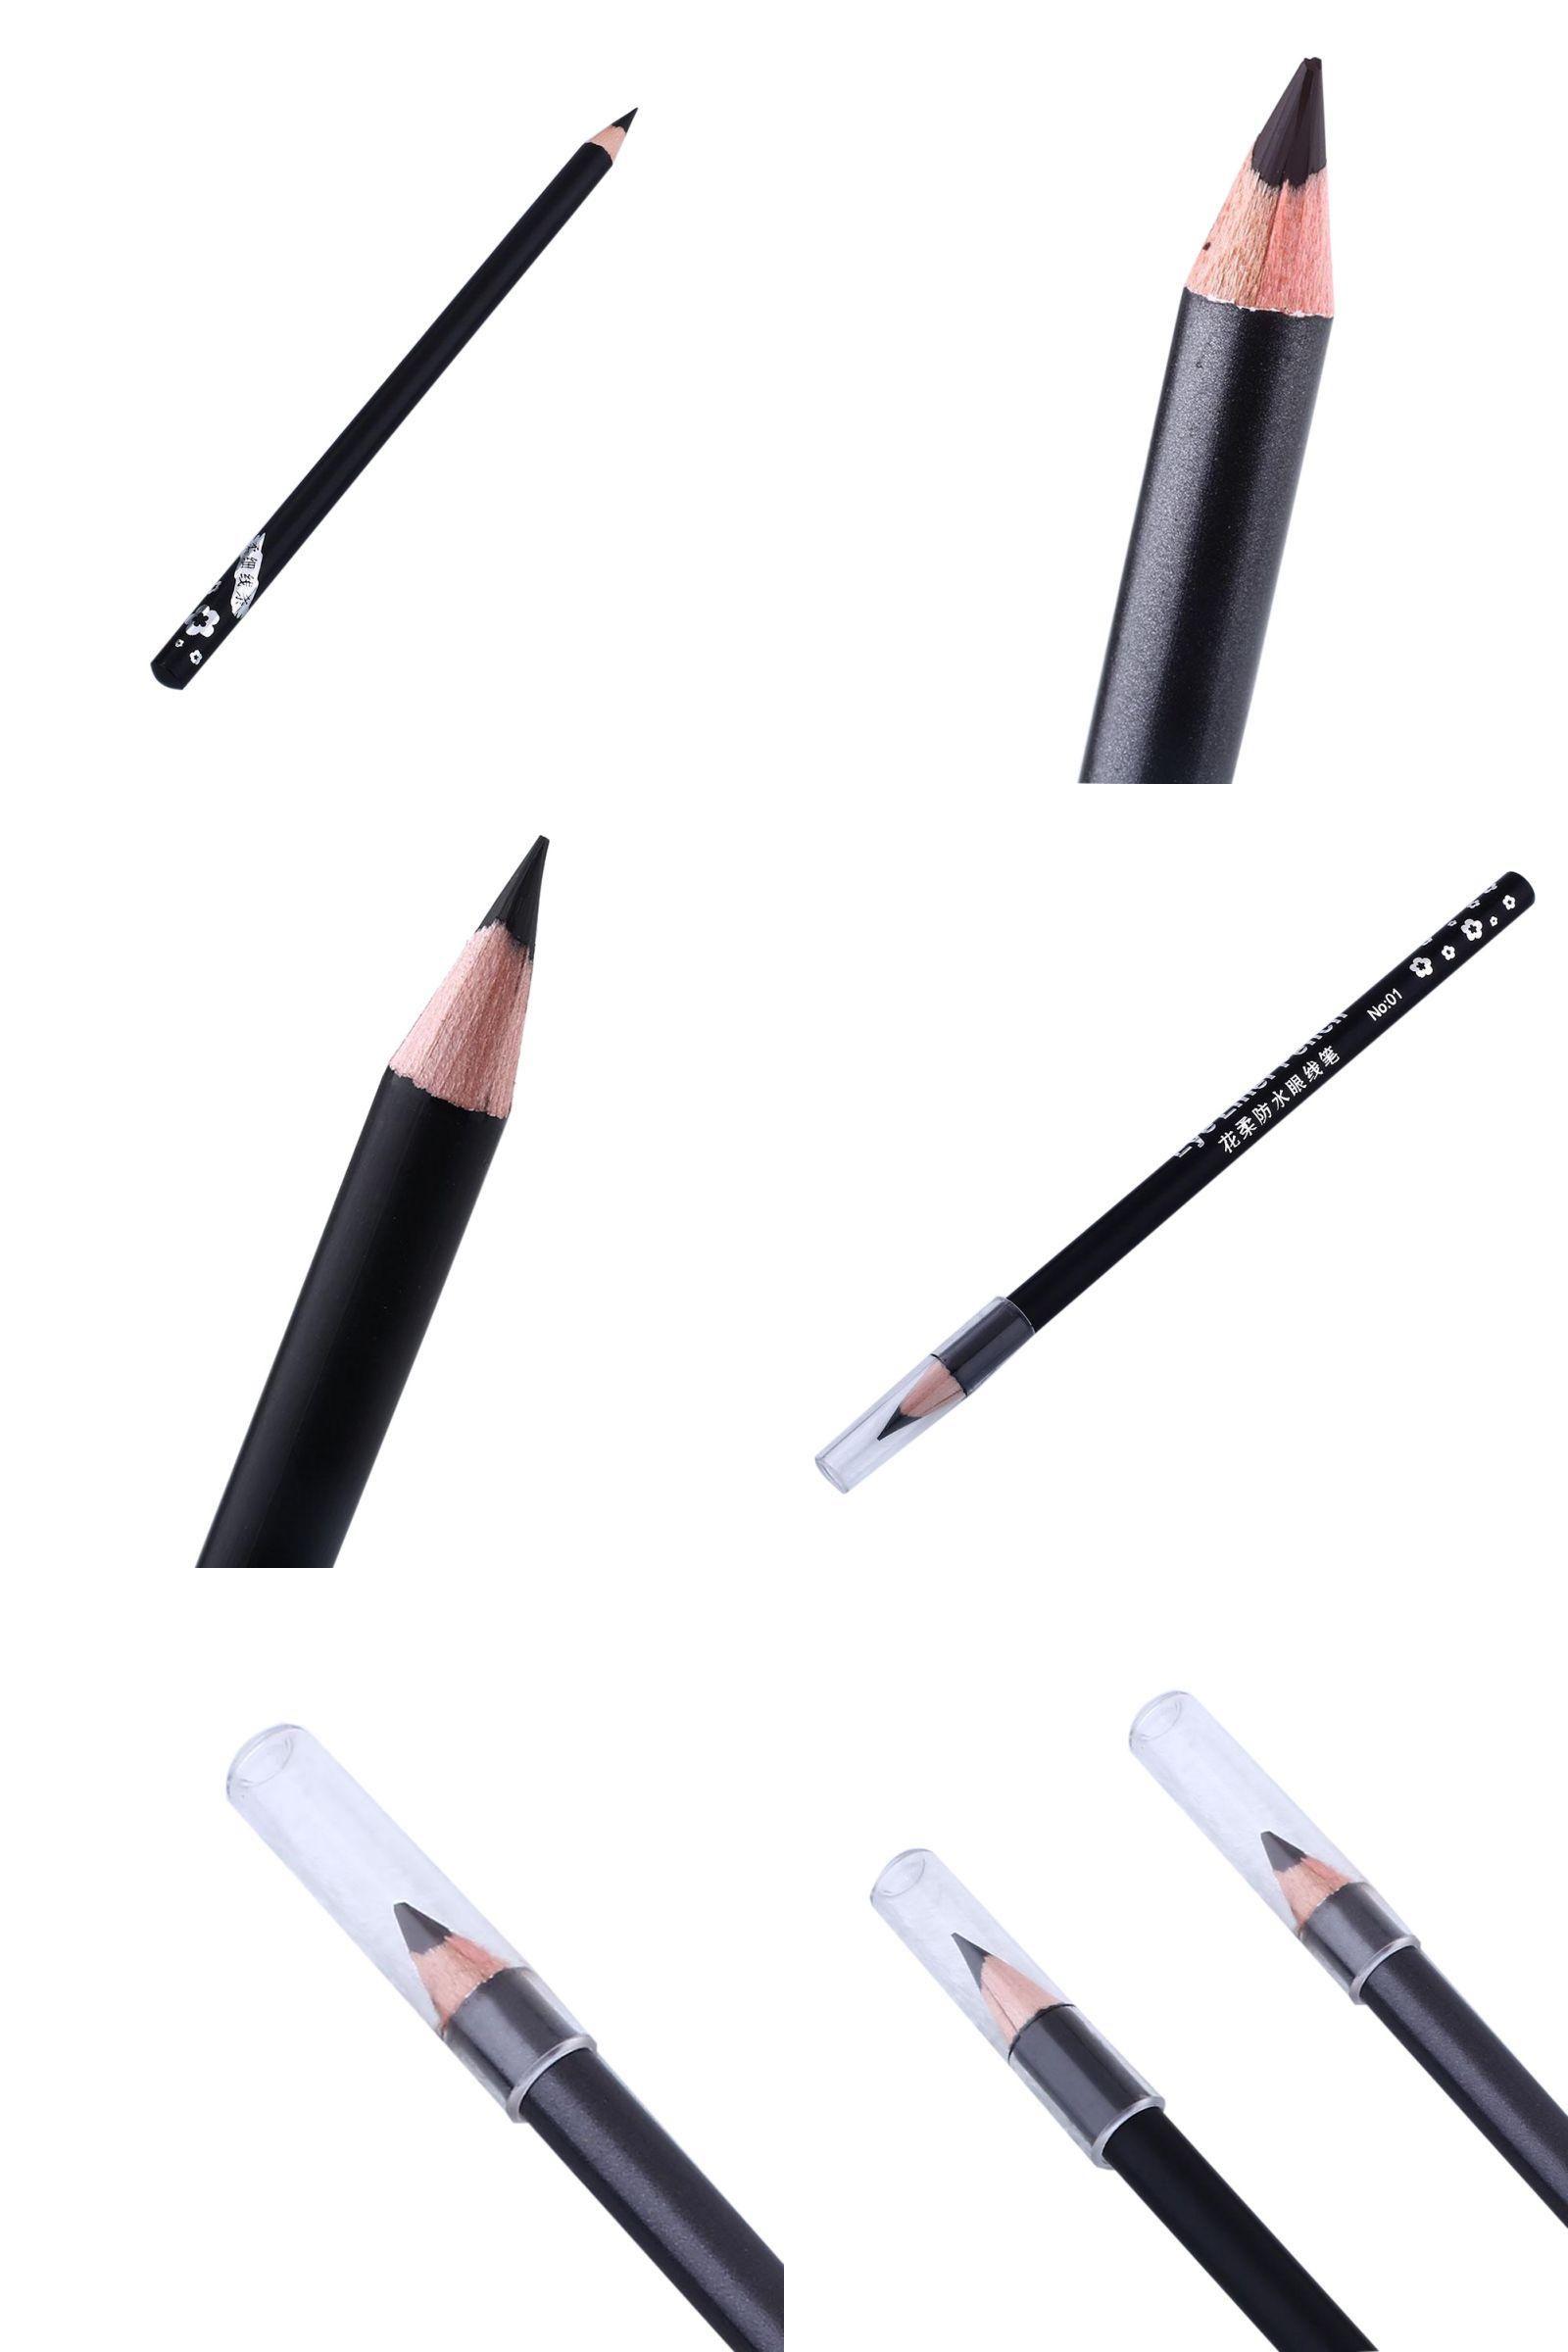 af24fed5479 [Visit to Buy] Fashion Professional Waterproof Liquid Eyeliner Delineador  Pen Pencil Cosmetic Eye Eyebrow Beauty Makeup Maquiagem Tools Hot B6 # ...